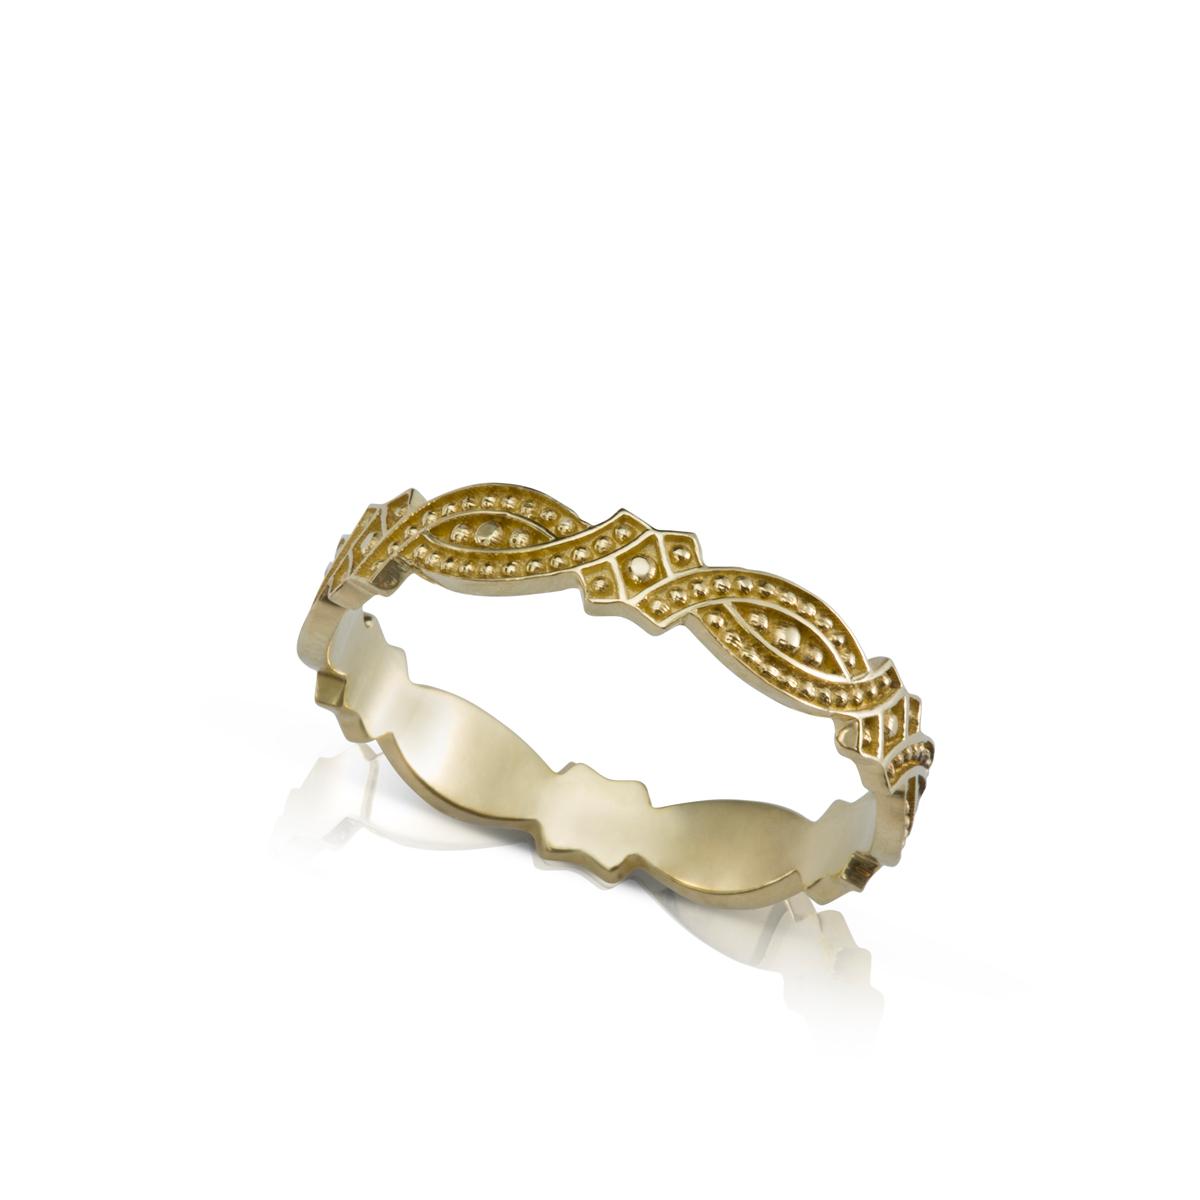 טבעת נישואין בסגנון וינטאג'